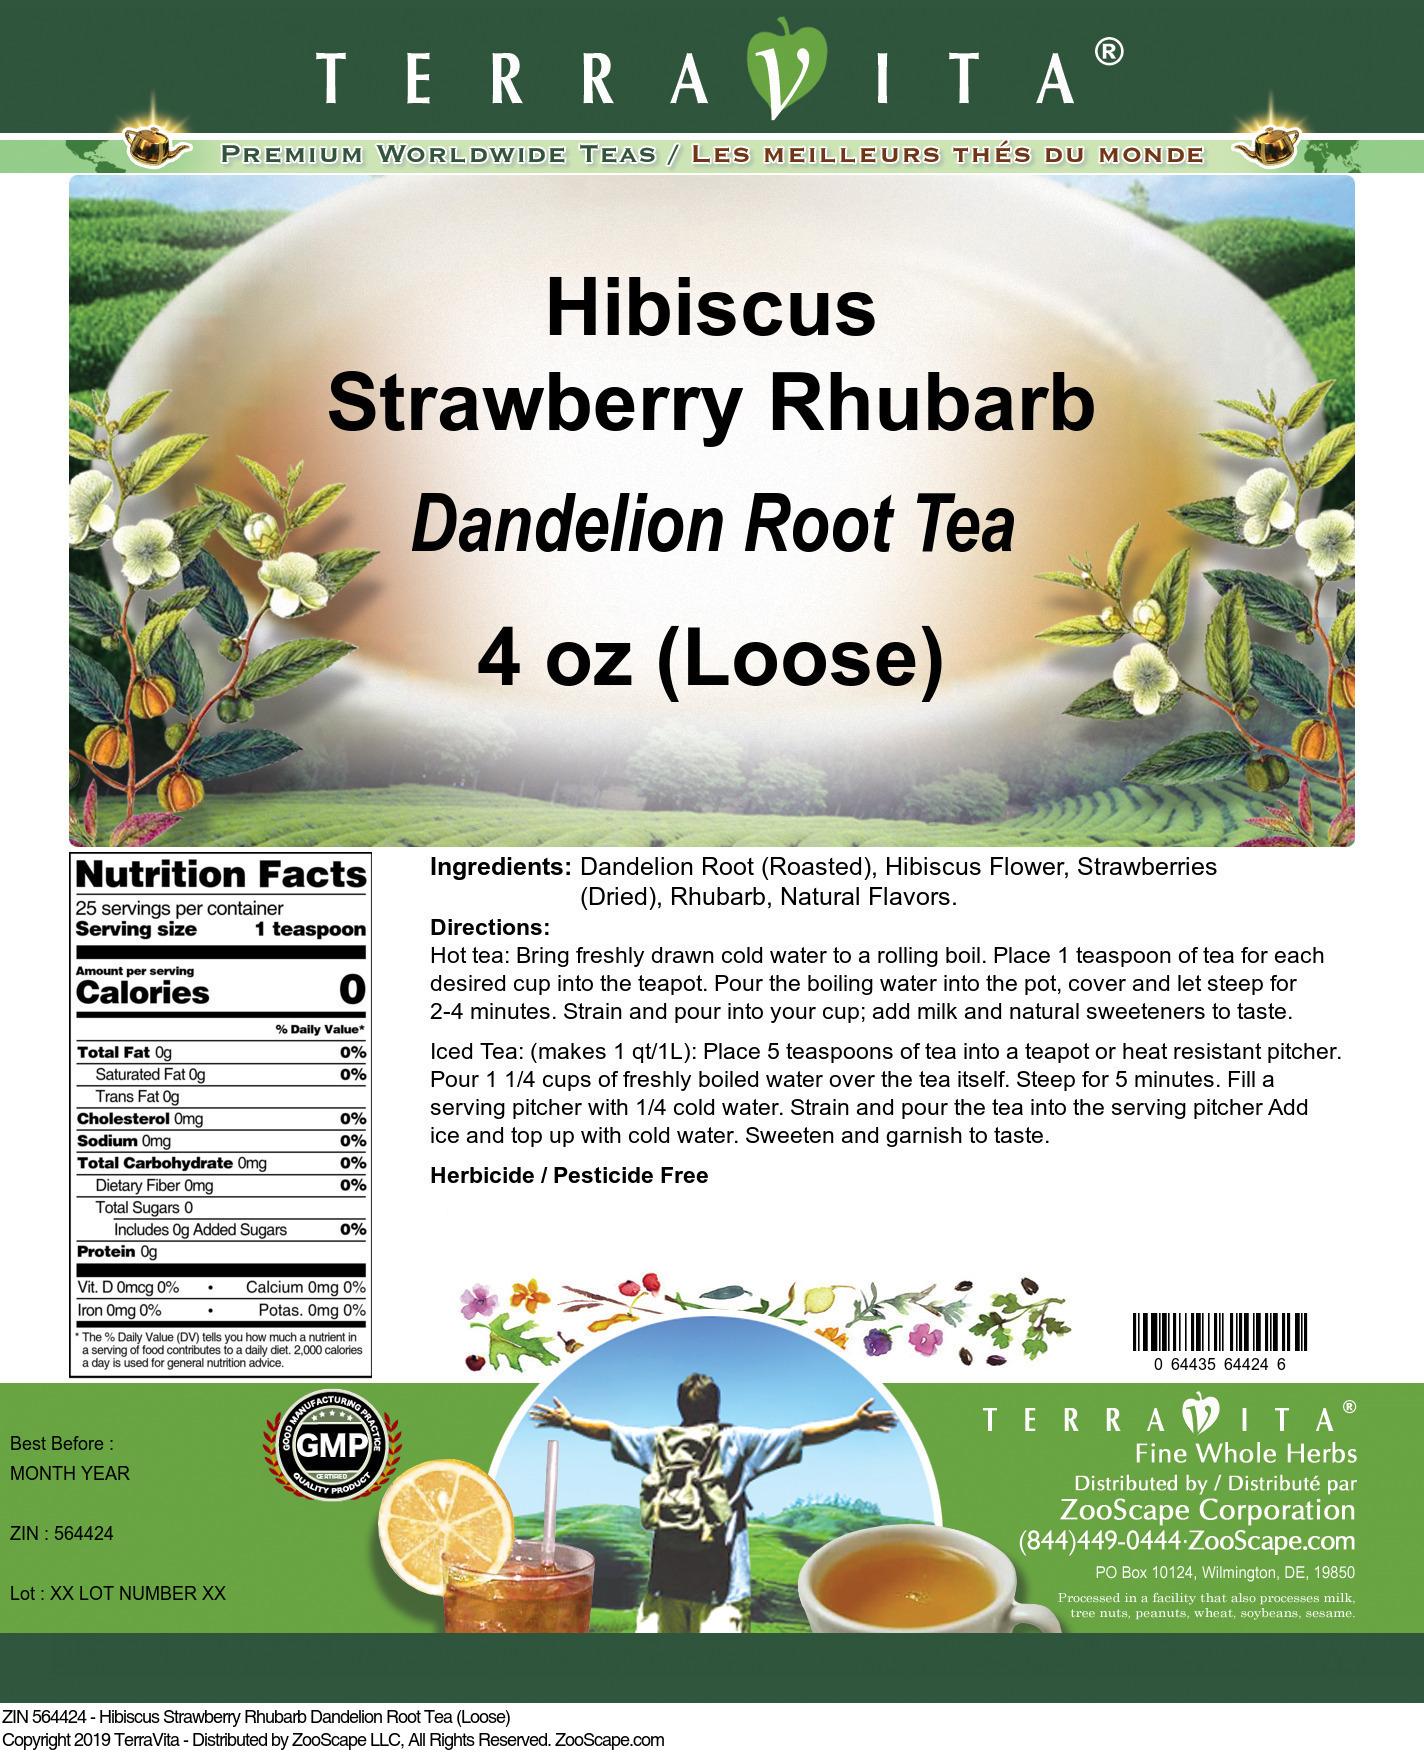 Hibiscus Strawberry Rhubarb Dandelion Root Tea (Loose)